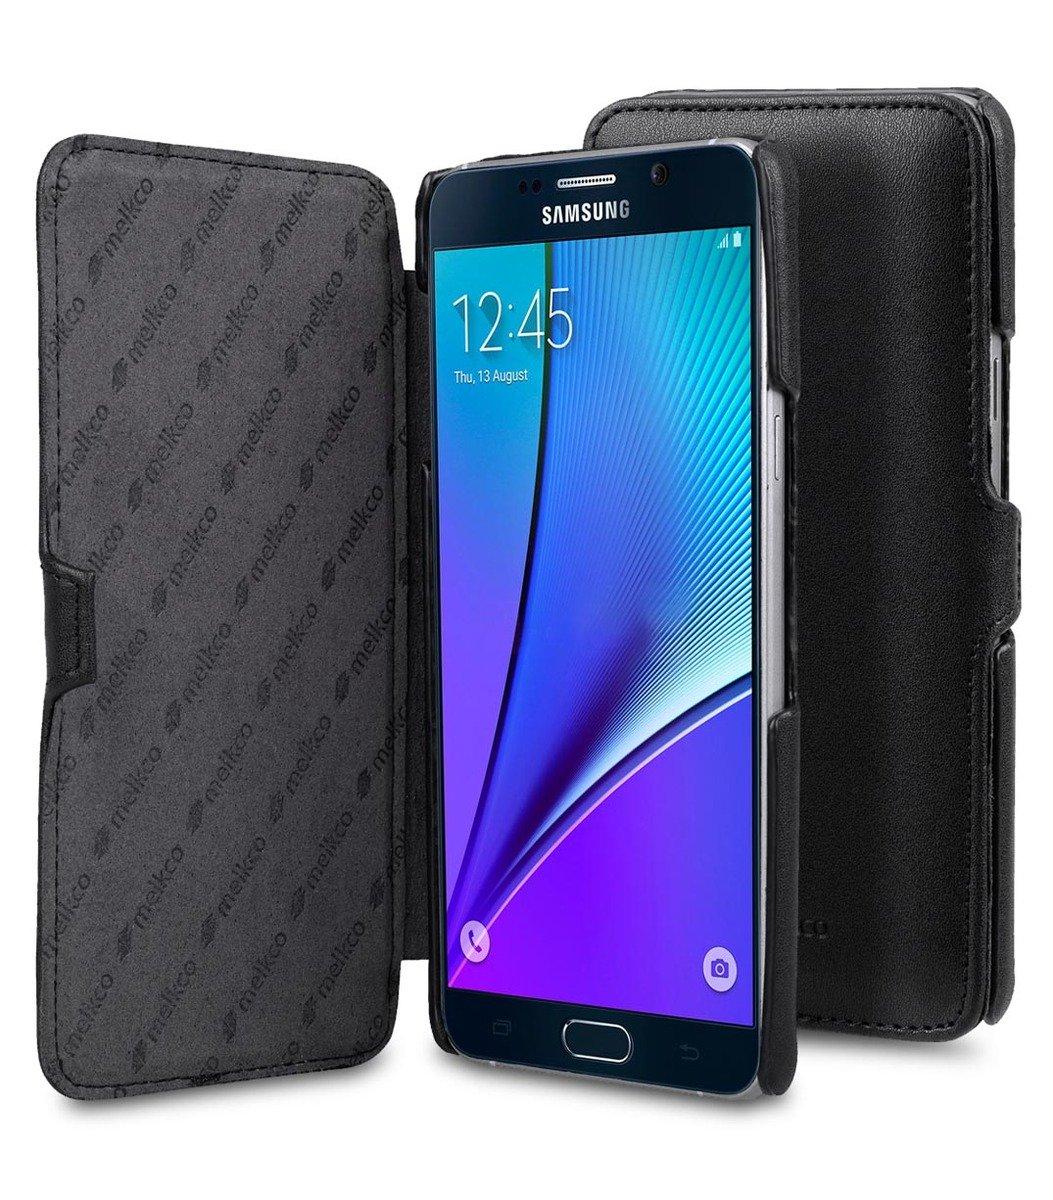 Samsung Galaxy Note 5 Booka Type 高級真皮革手機套 - 黑色